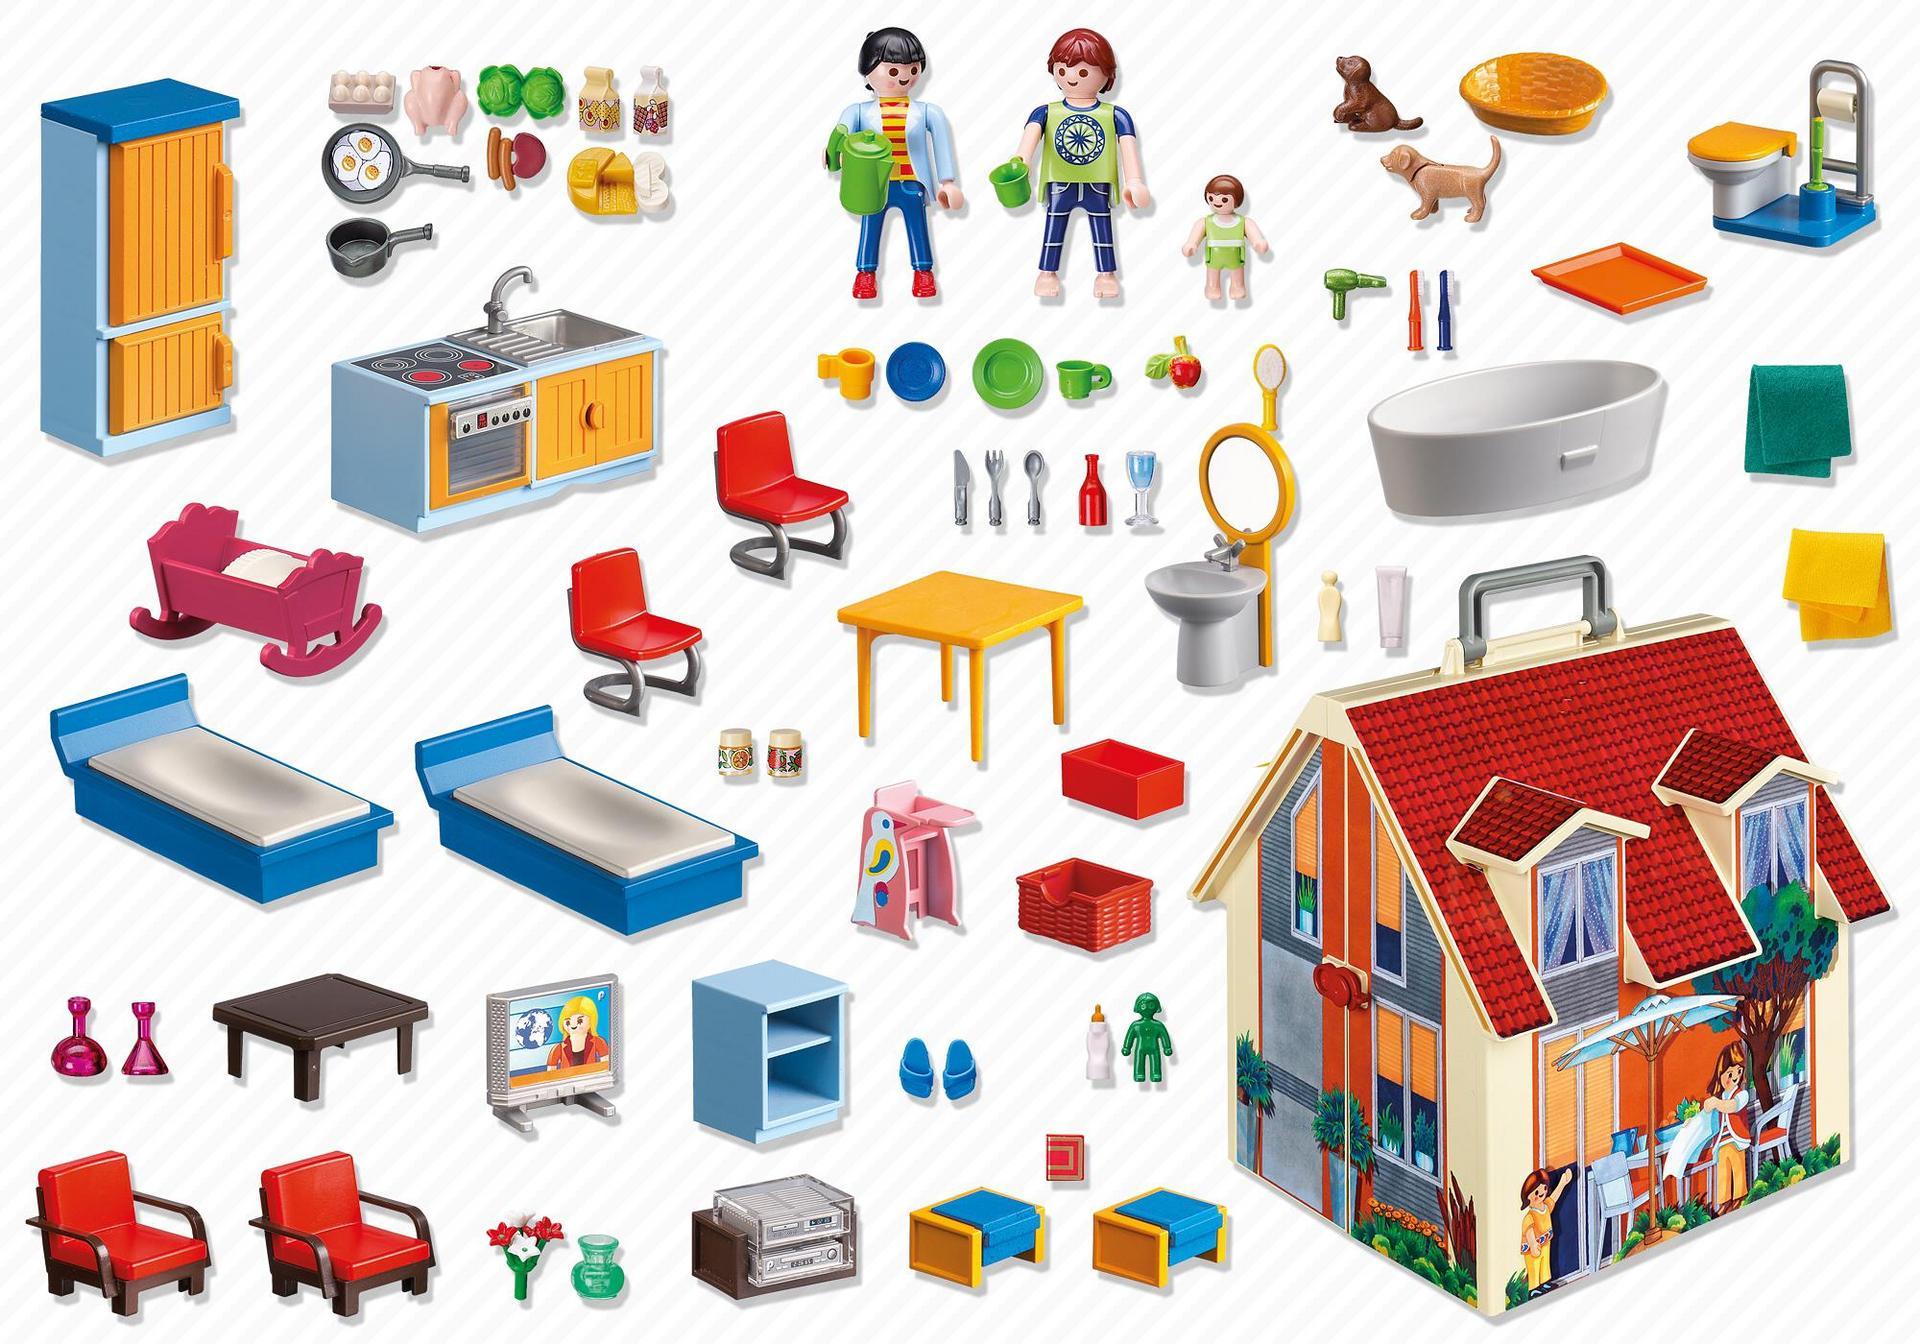 Take Along Modern Doll House - 5167 - PLAYMOBIL® USA